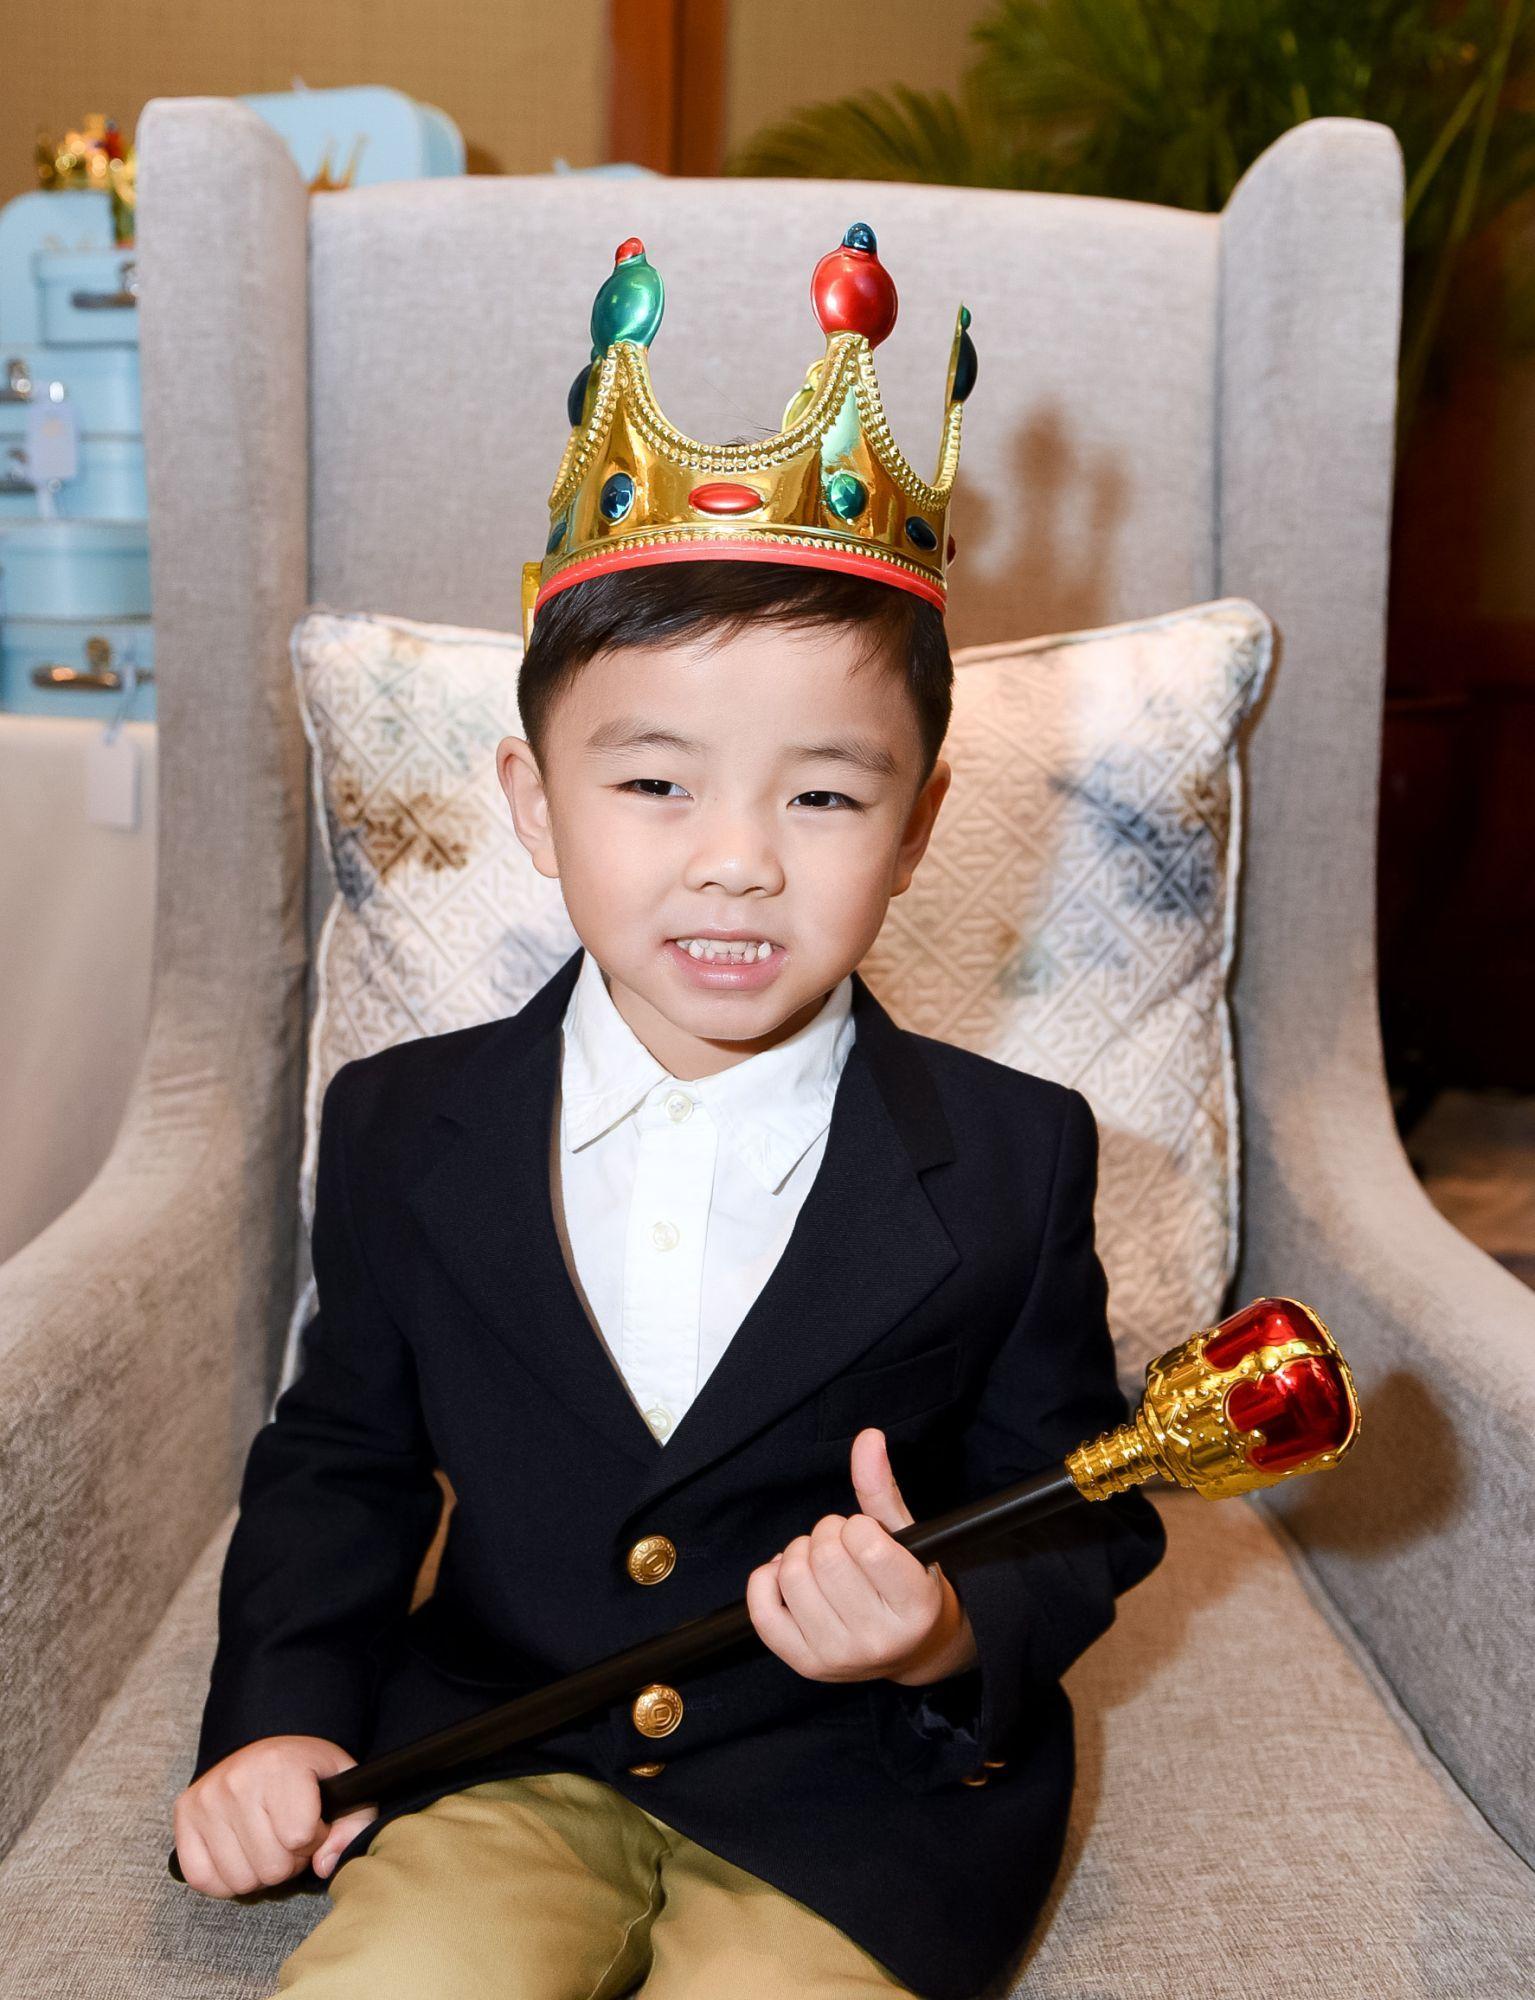 6 Of Society's Most Memorable Kids' Celebrations